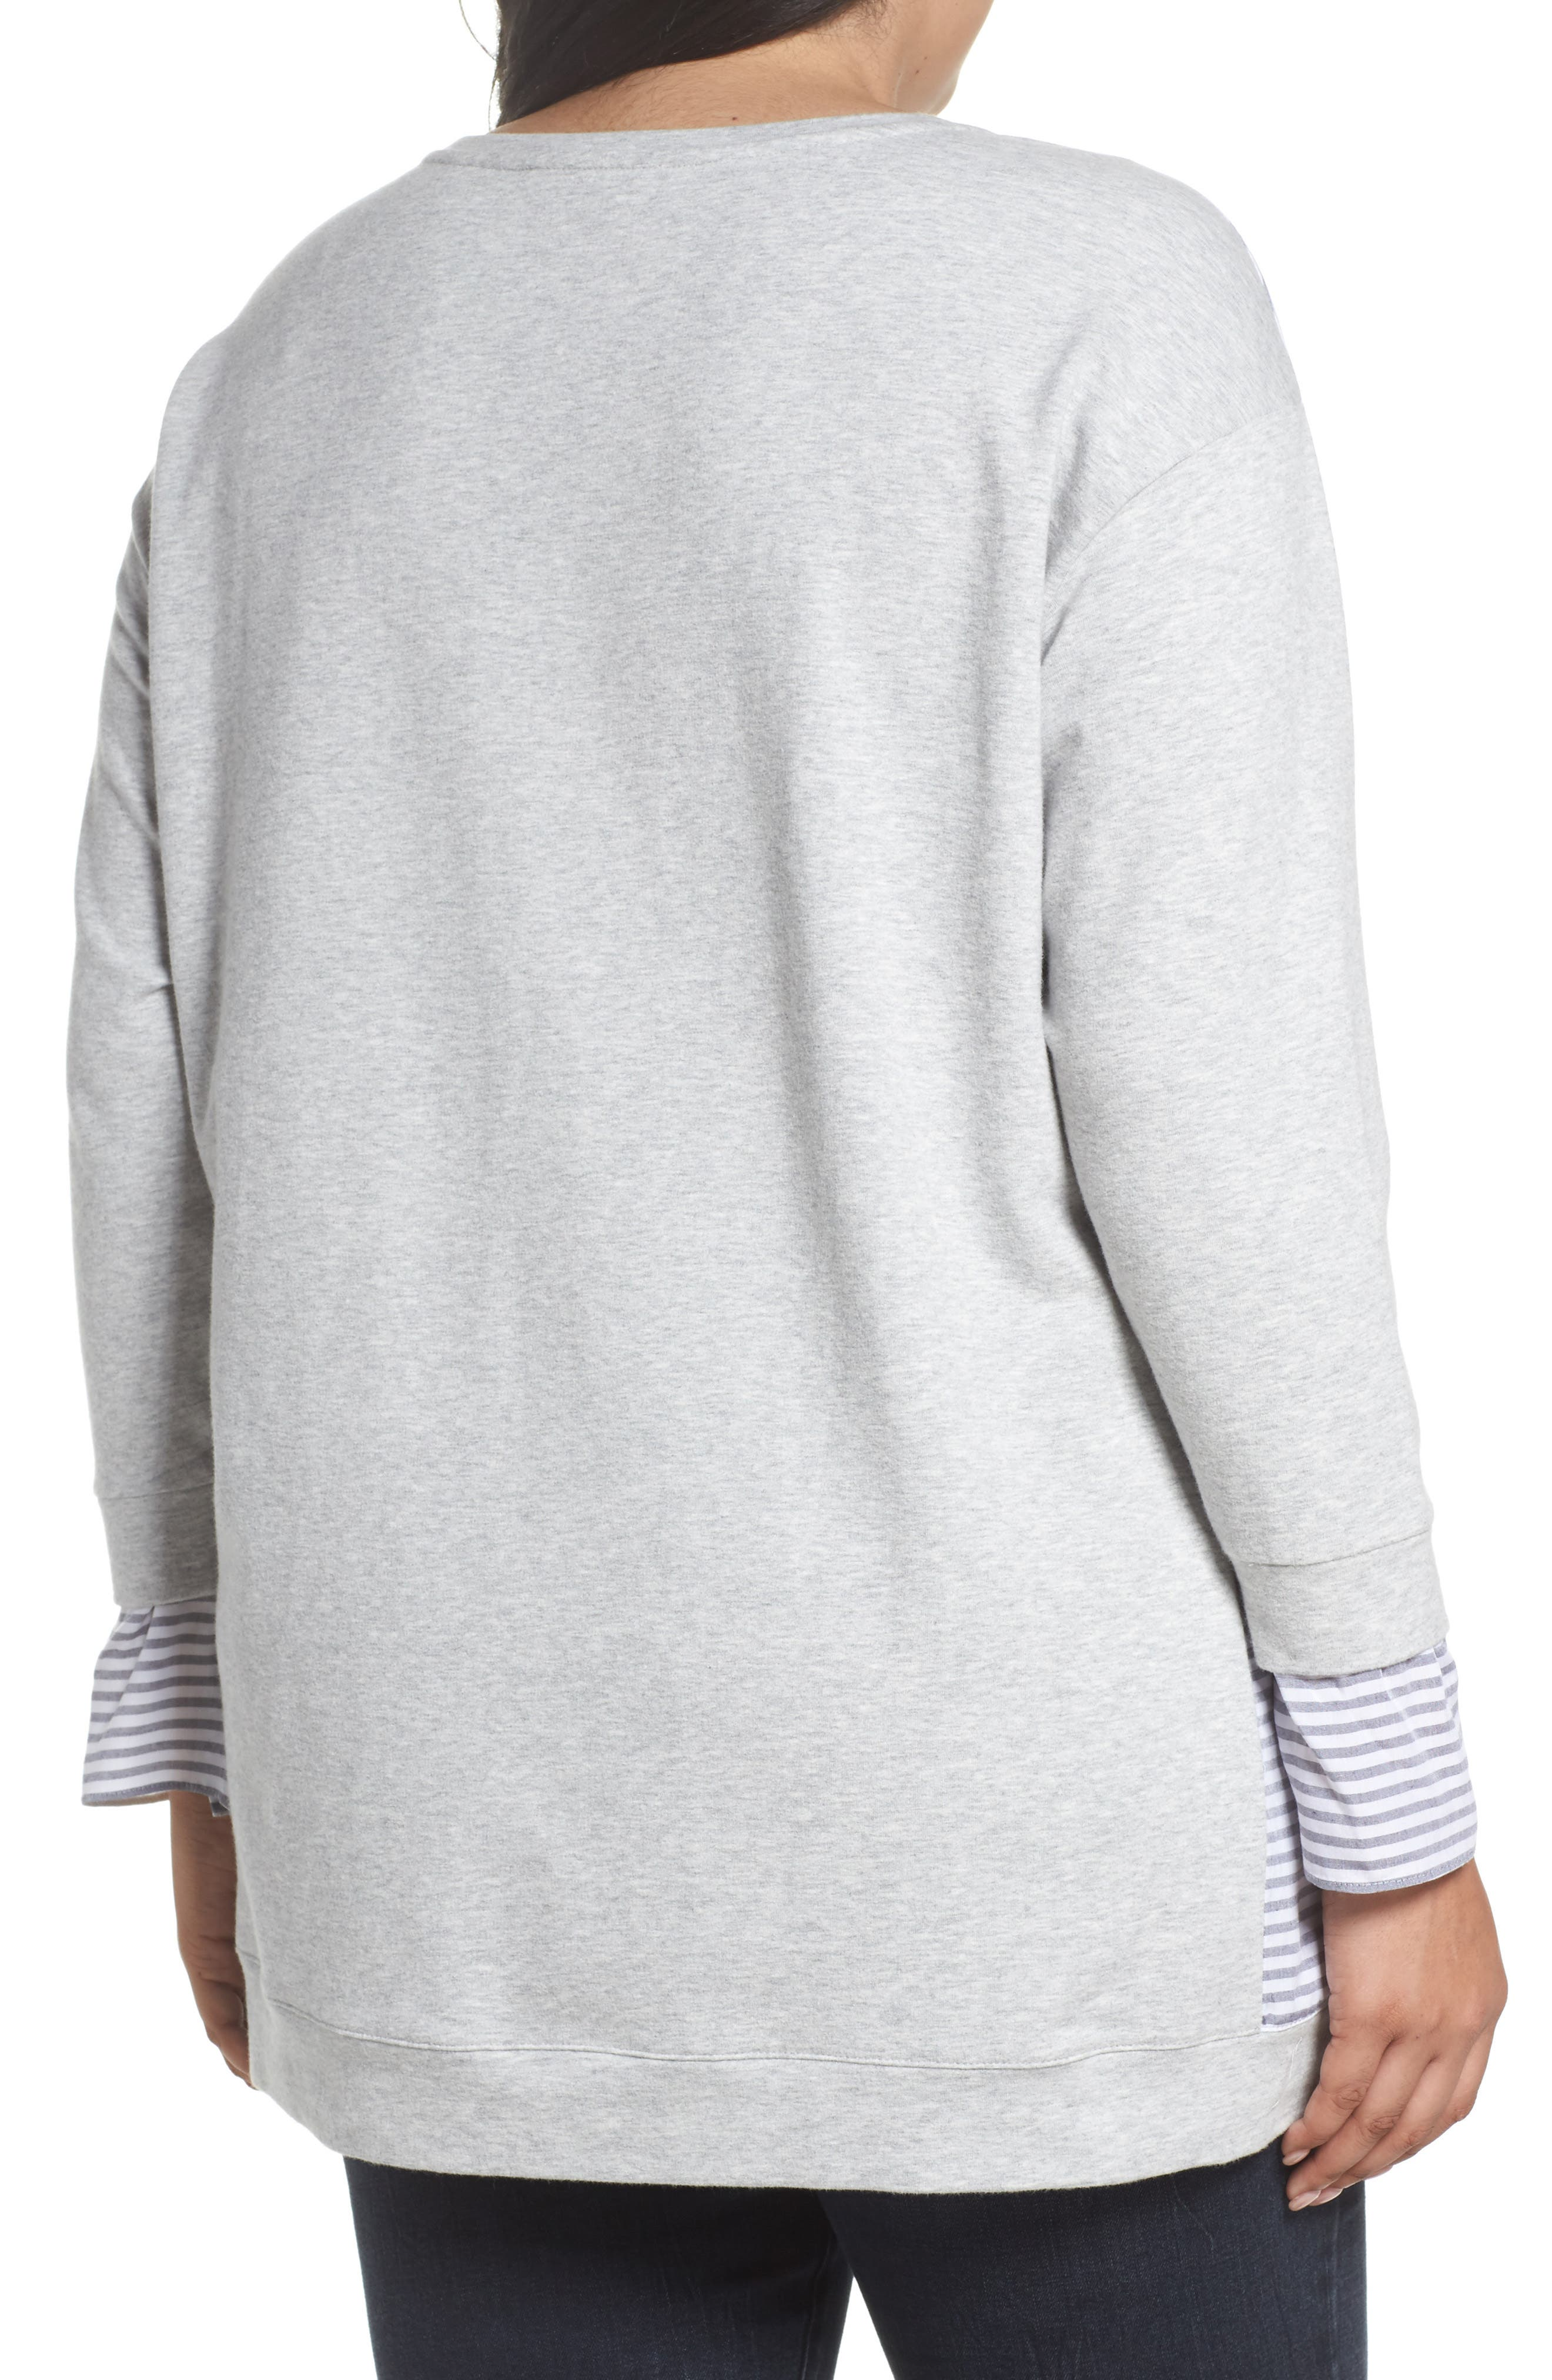 Mixed Media Sweatshirt,                             Alternate thumbnail 2, color,                             Grey Heather